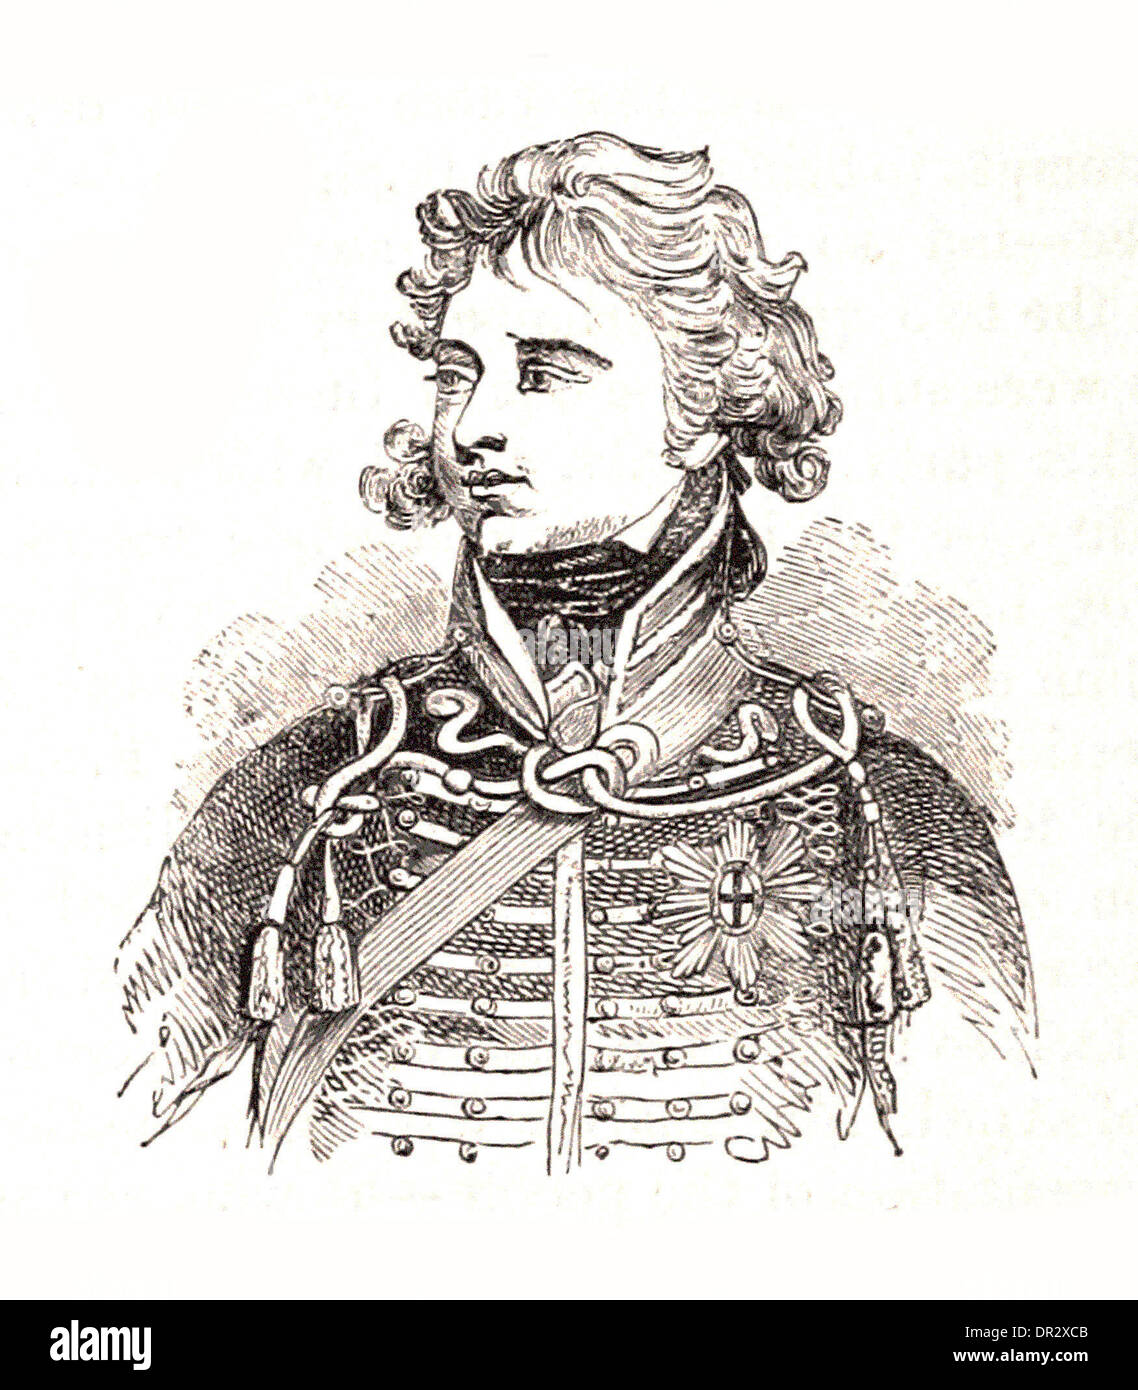 Portrait of Prince of Wales - Britsh engraving - Stock Image